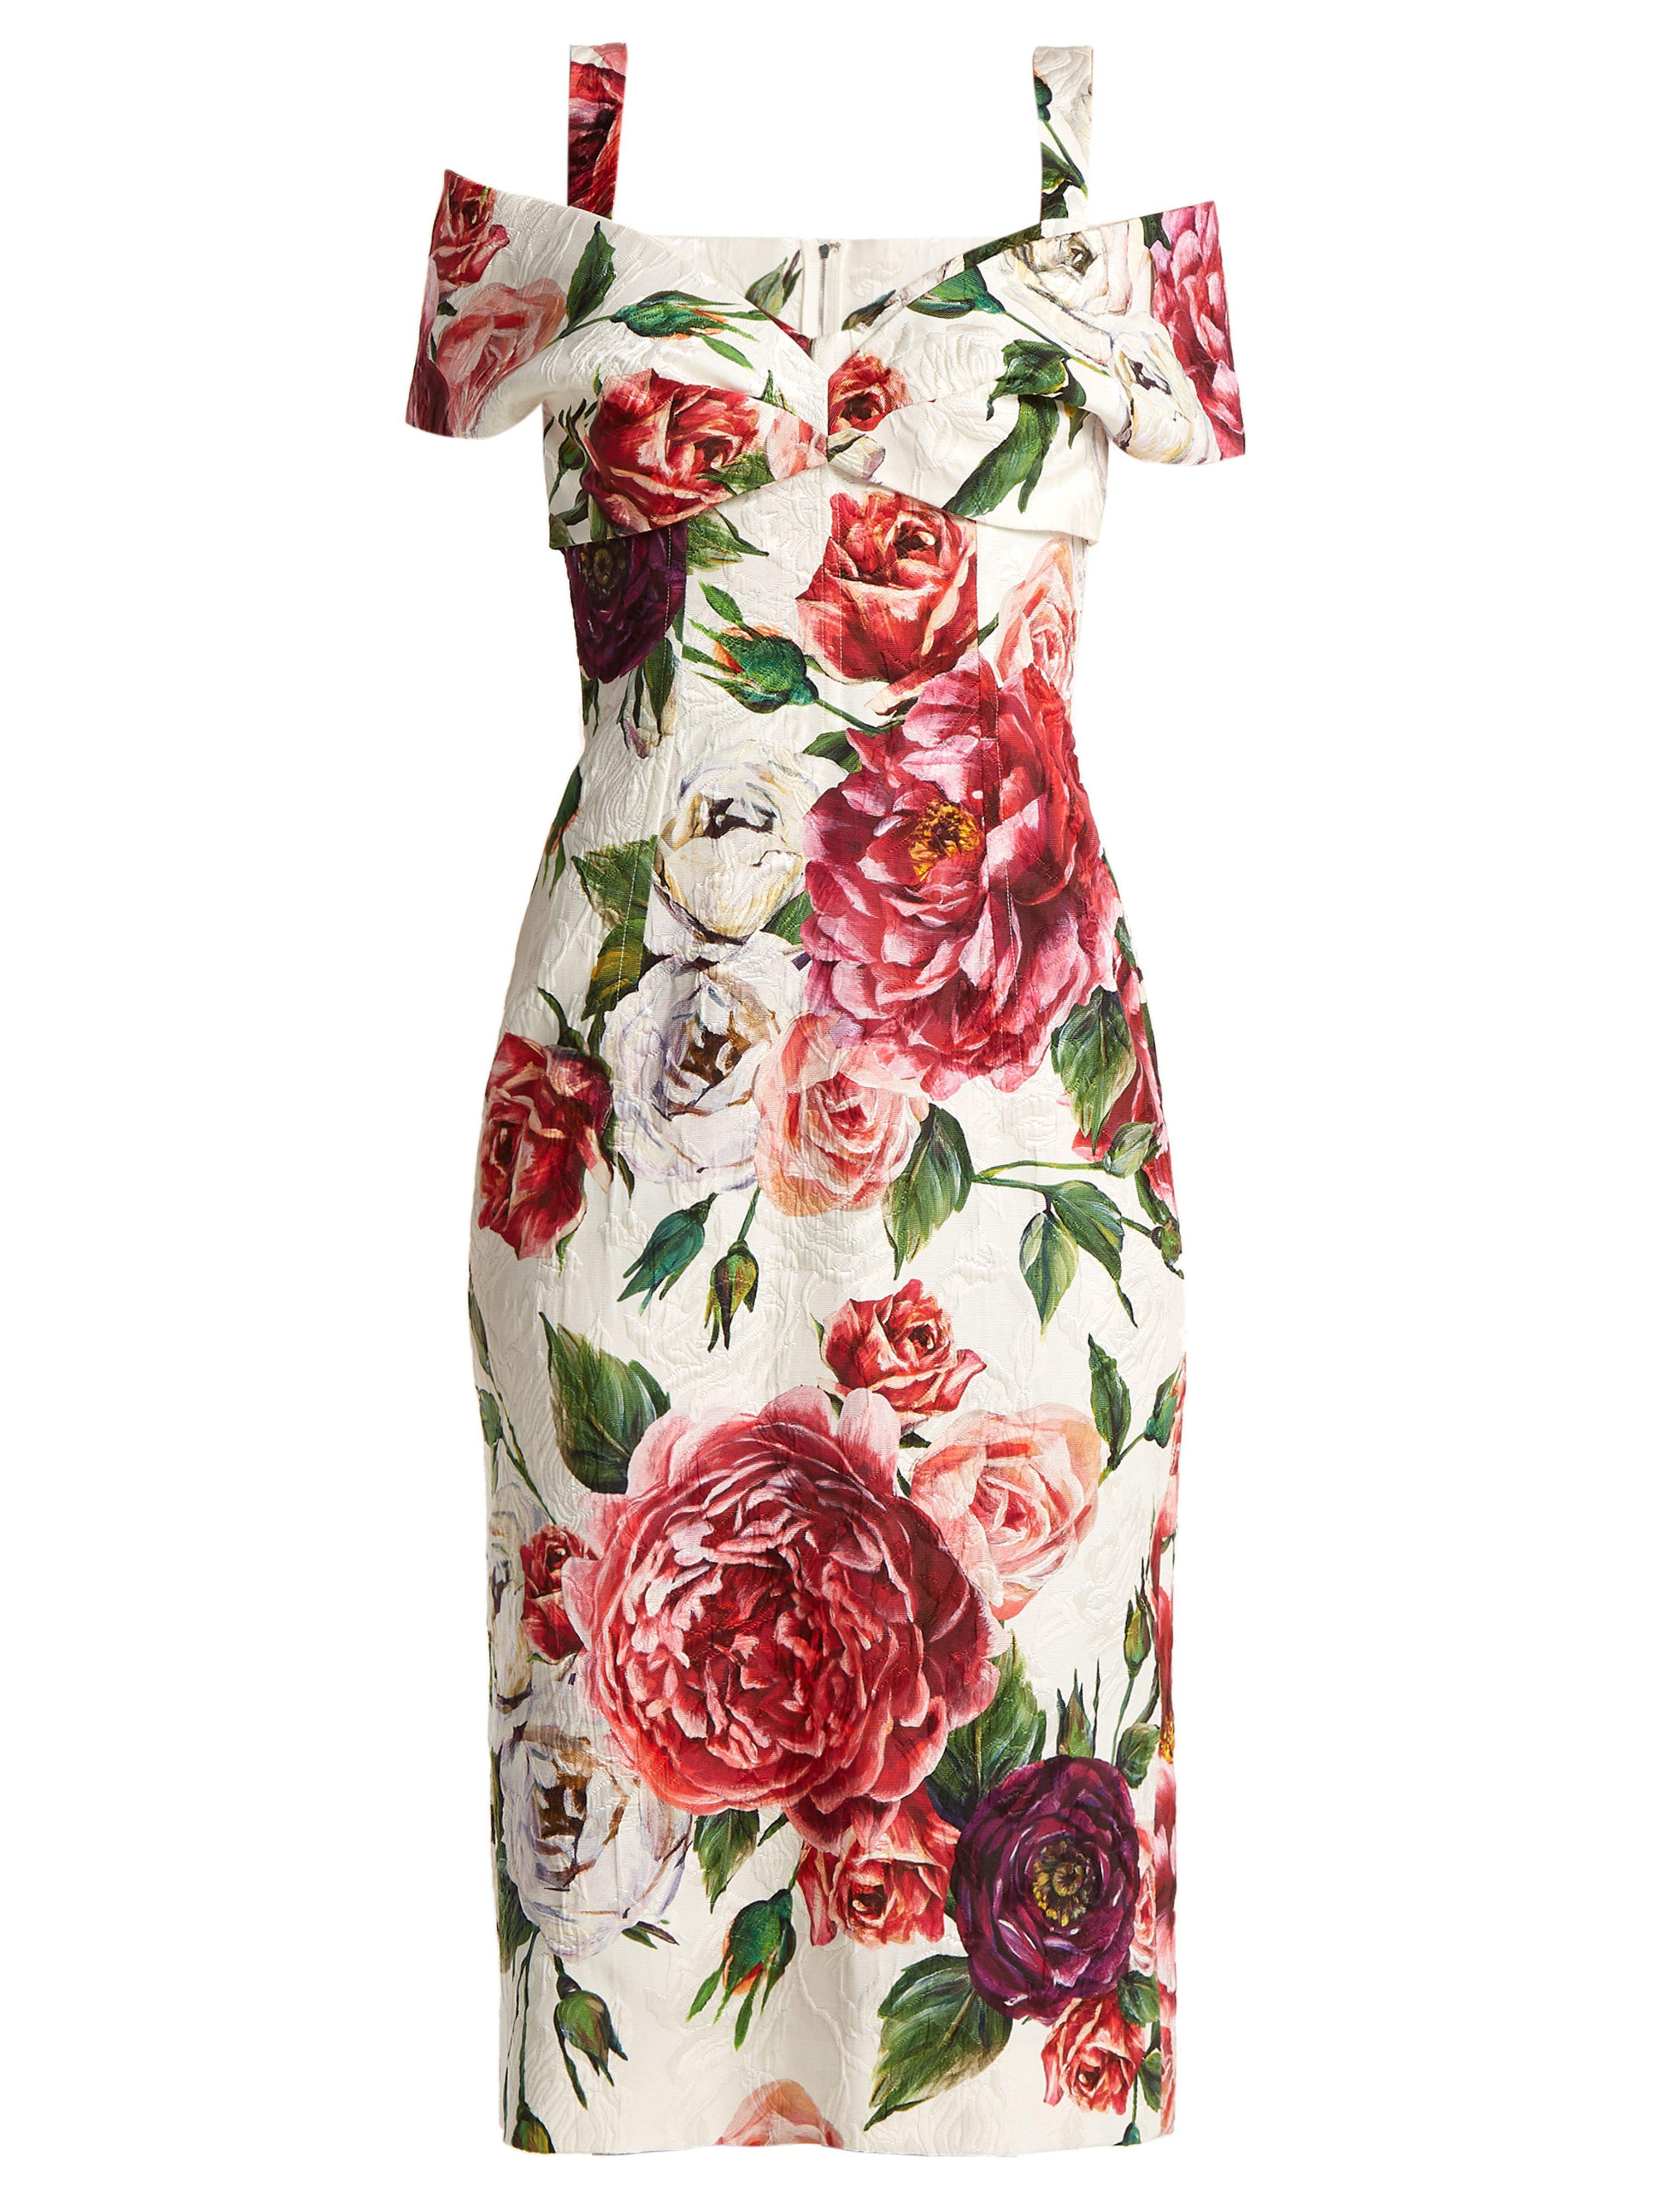 e3d552d702f Dolce & Gabbana Brocade Peony And Rose Print Dress - Lyst